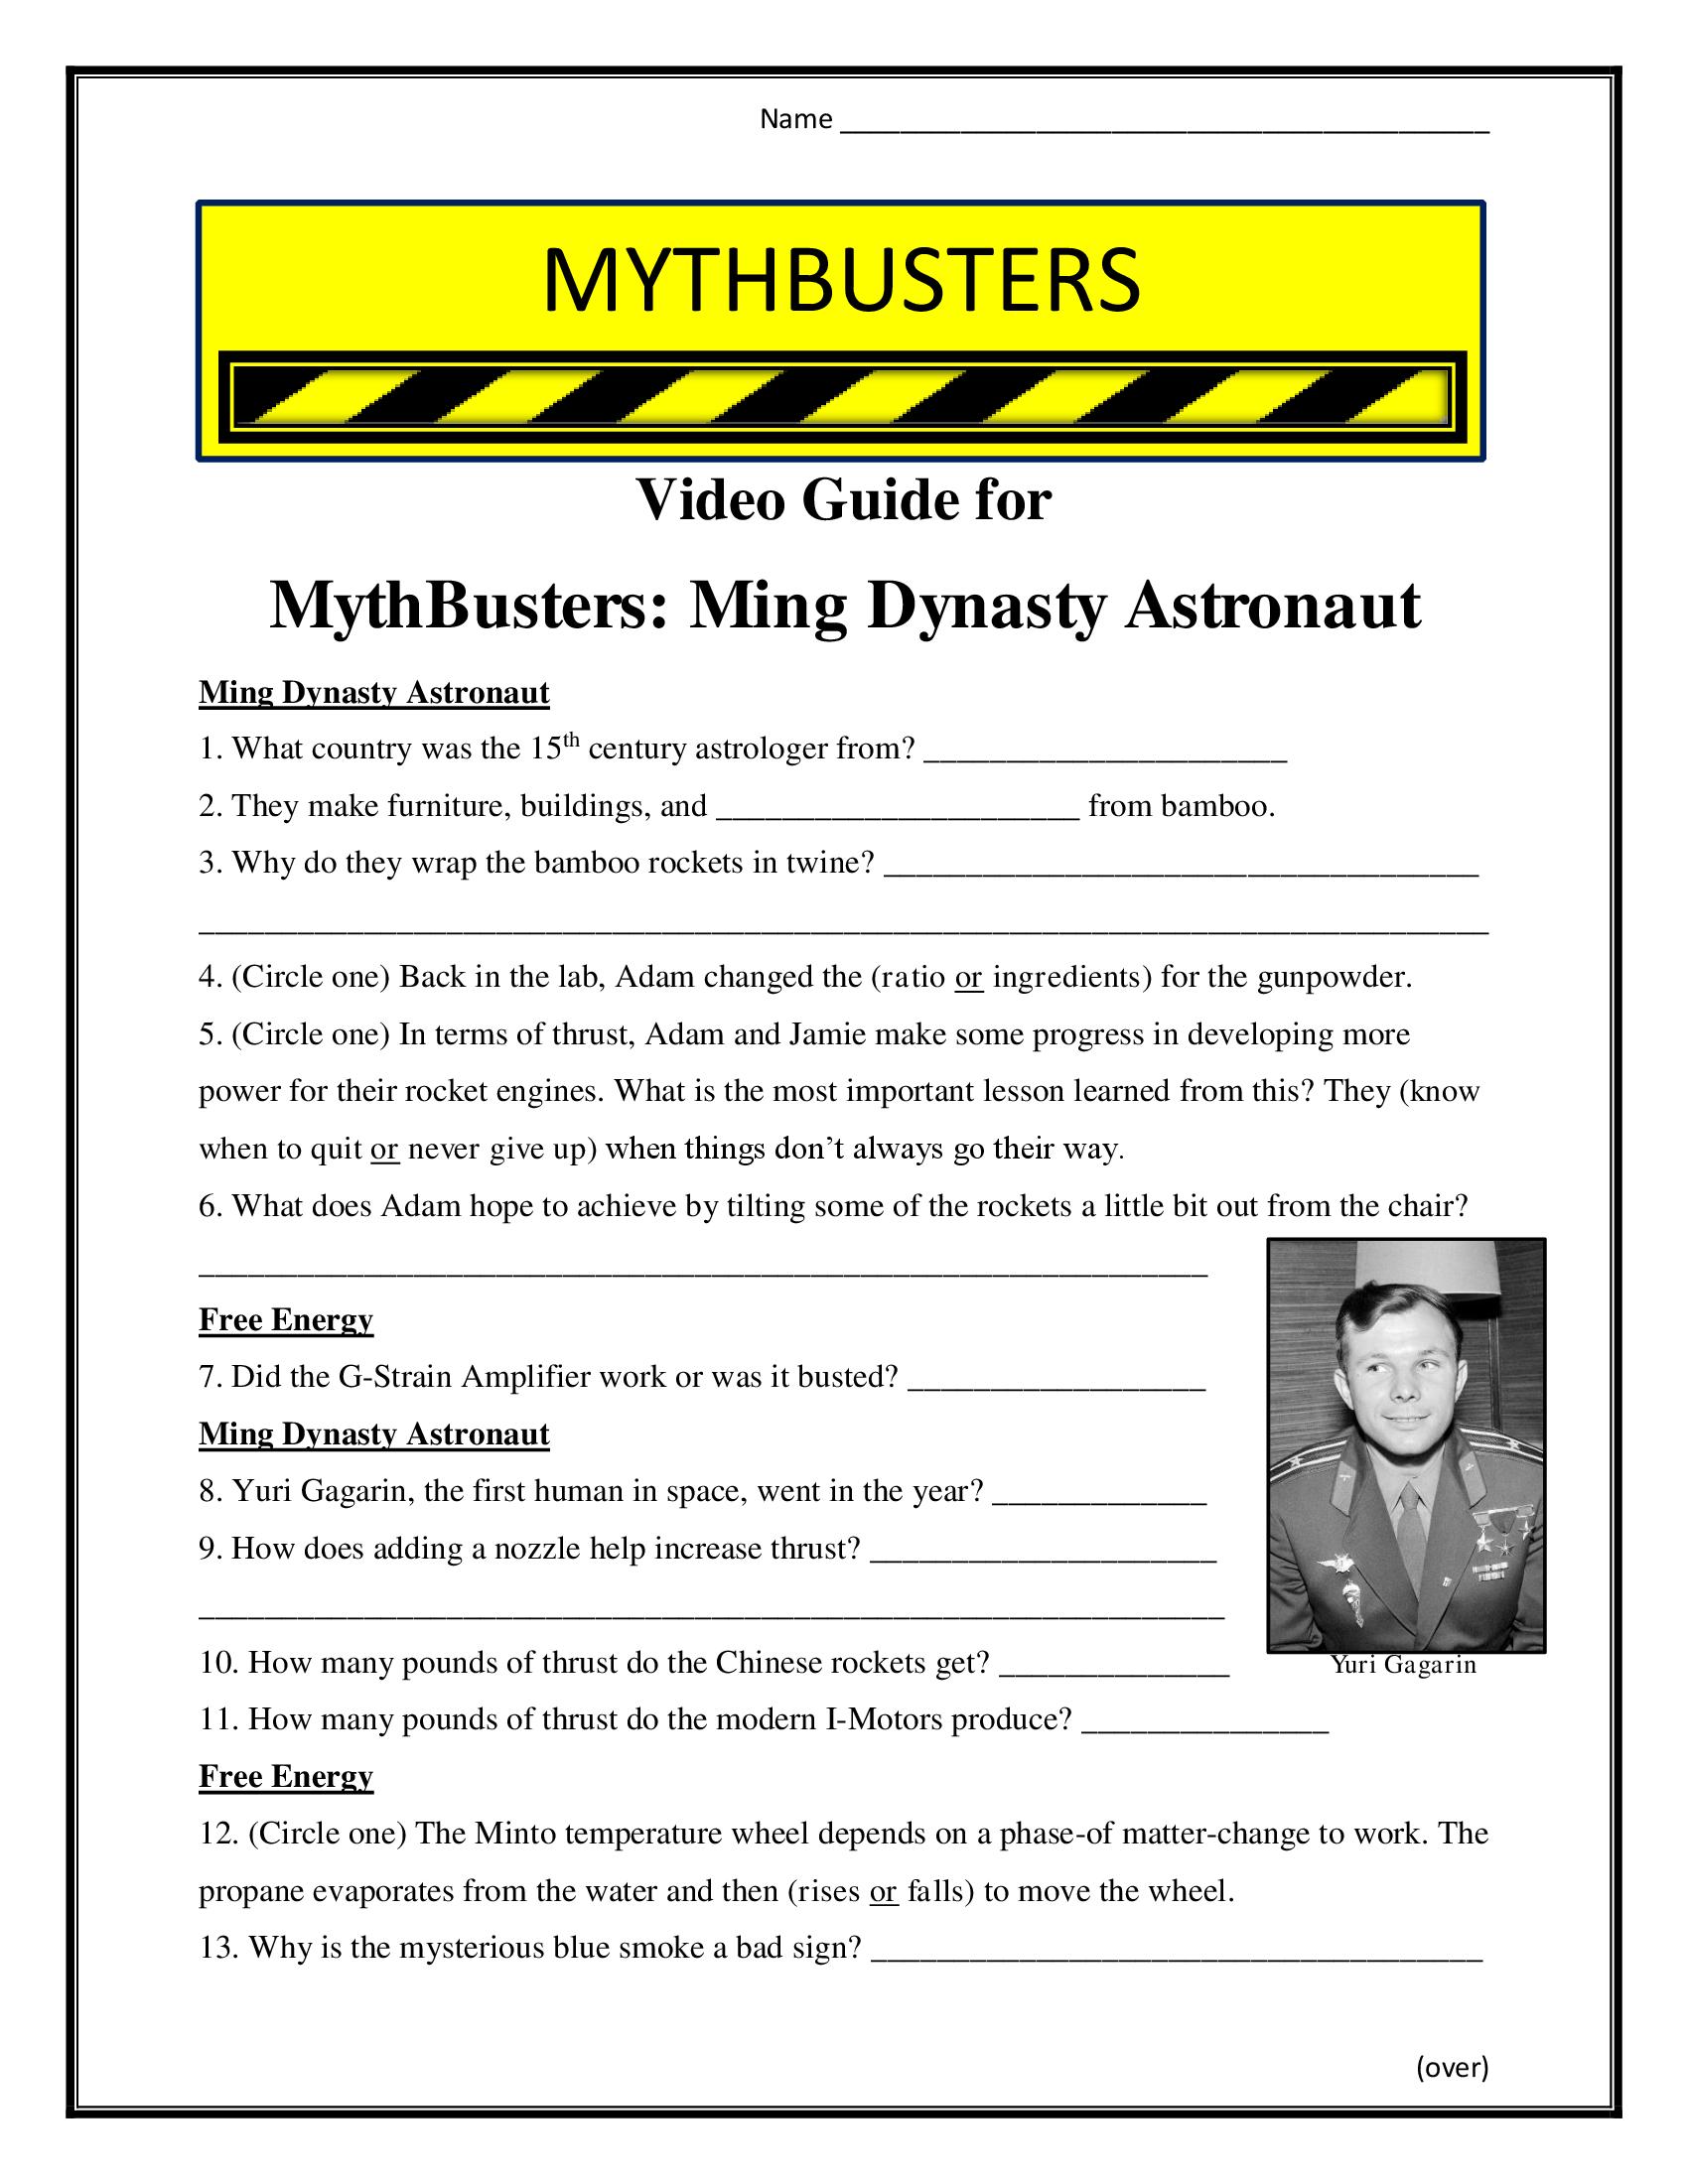 Mythbusters Ming Dynasty Astronaut Worksheet Season 2